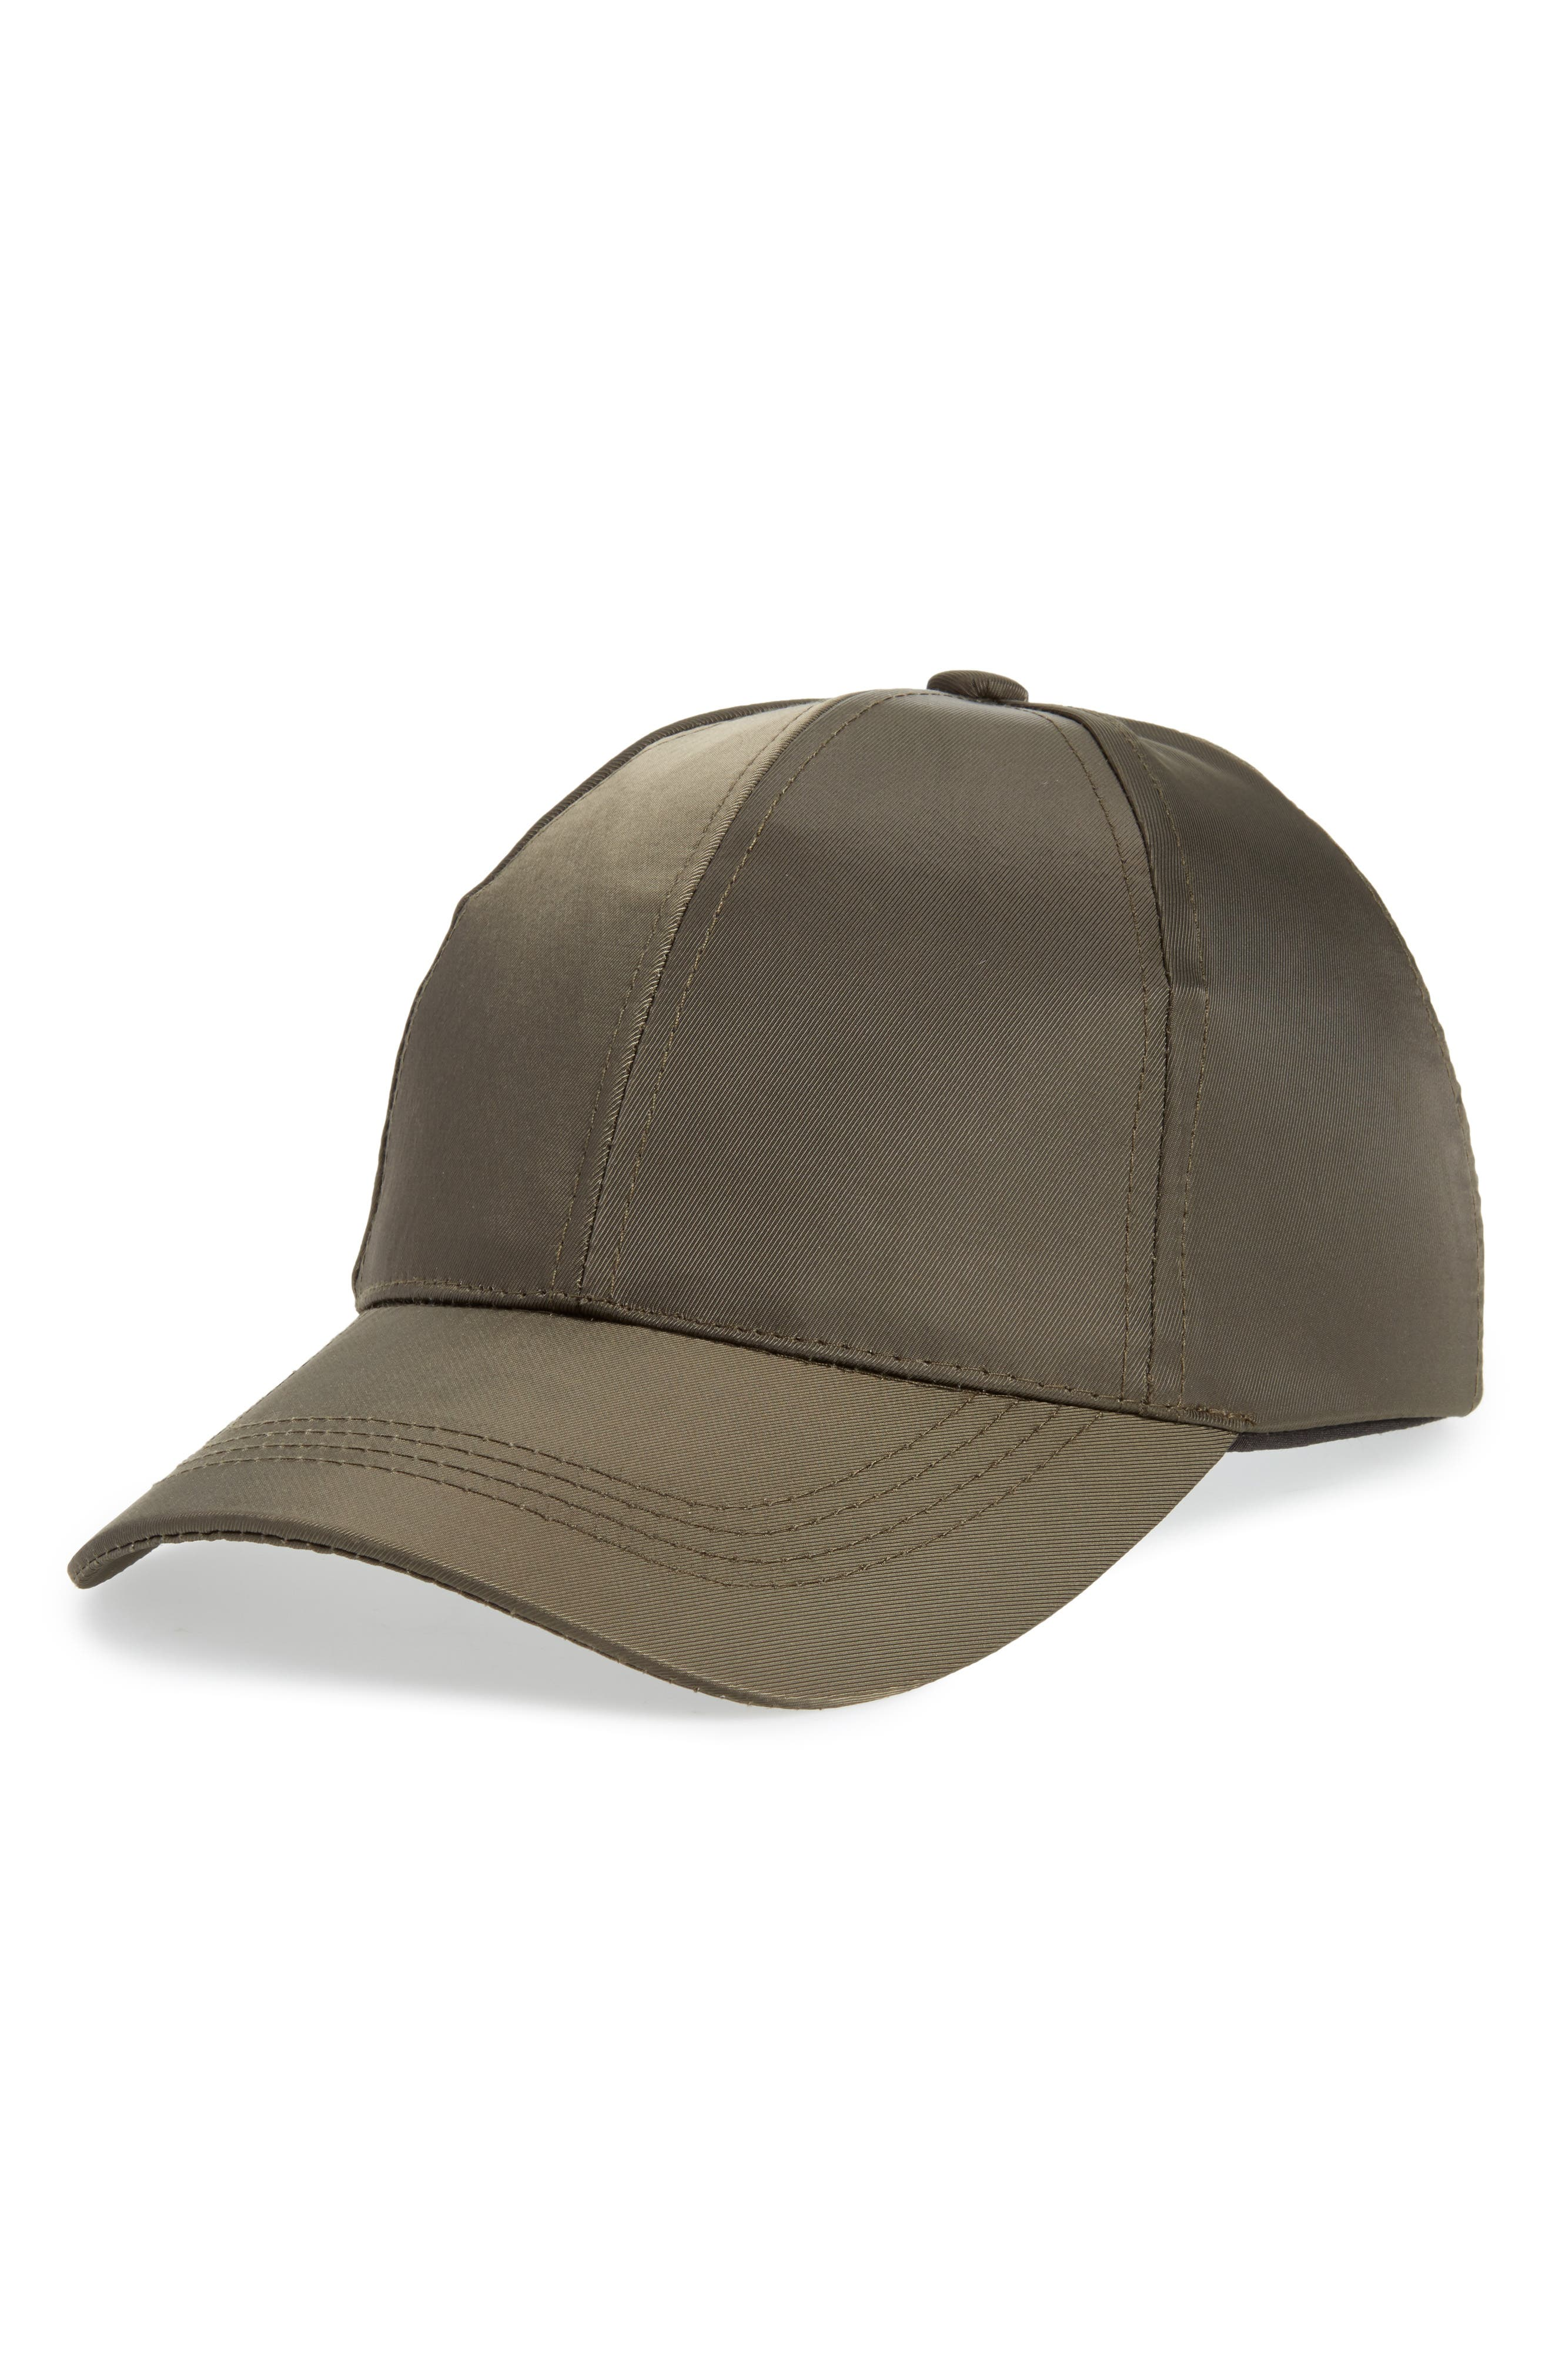 Water Repellent Baseball Hat,                             Main thumbnail 1, color,                             021